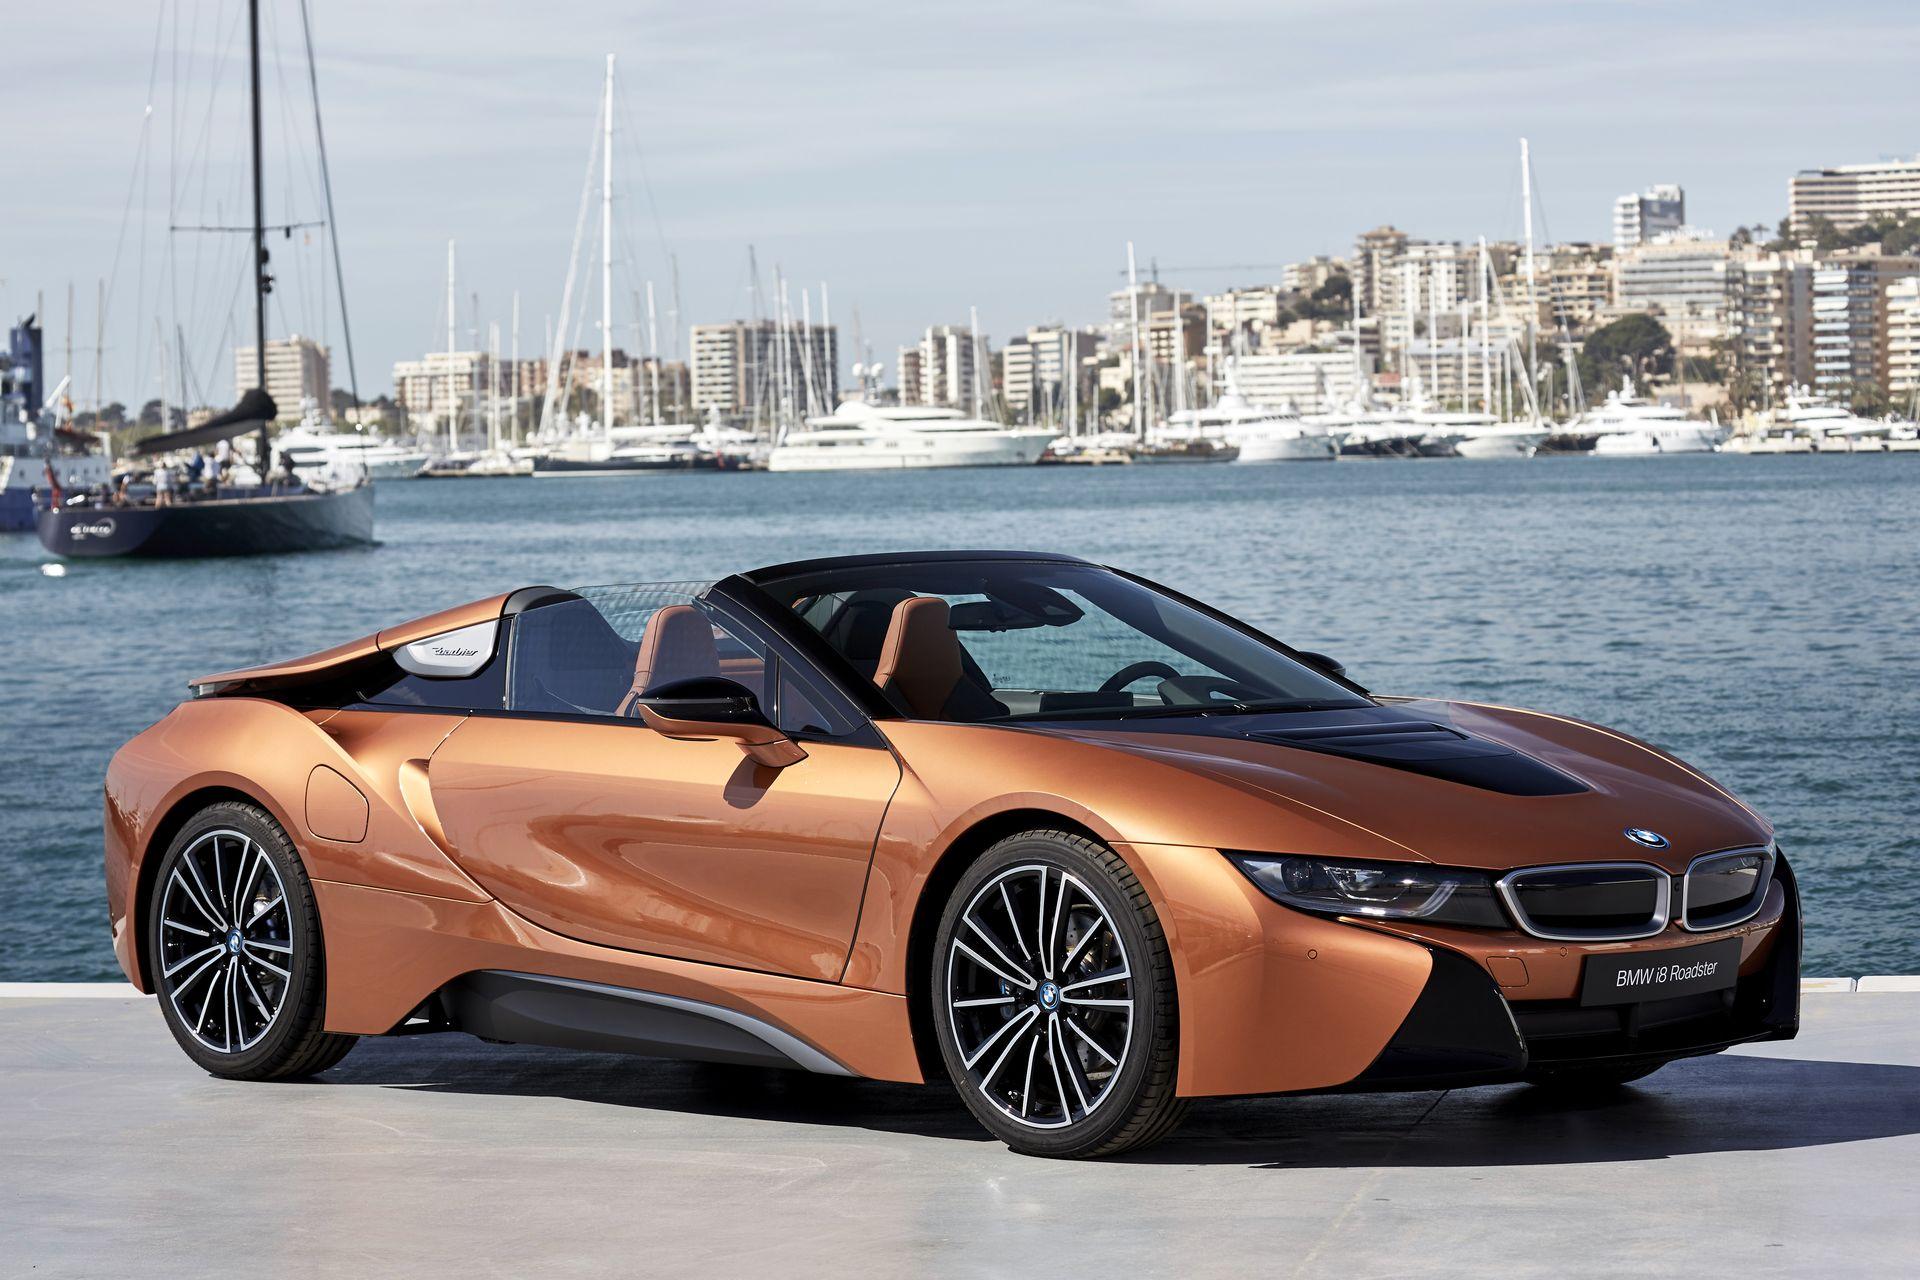 BMW_i8_insideevs.com